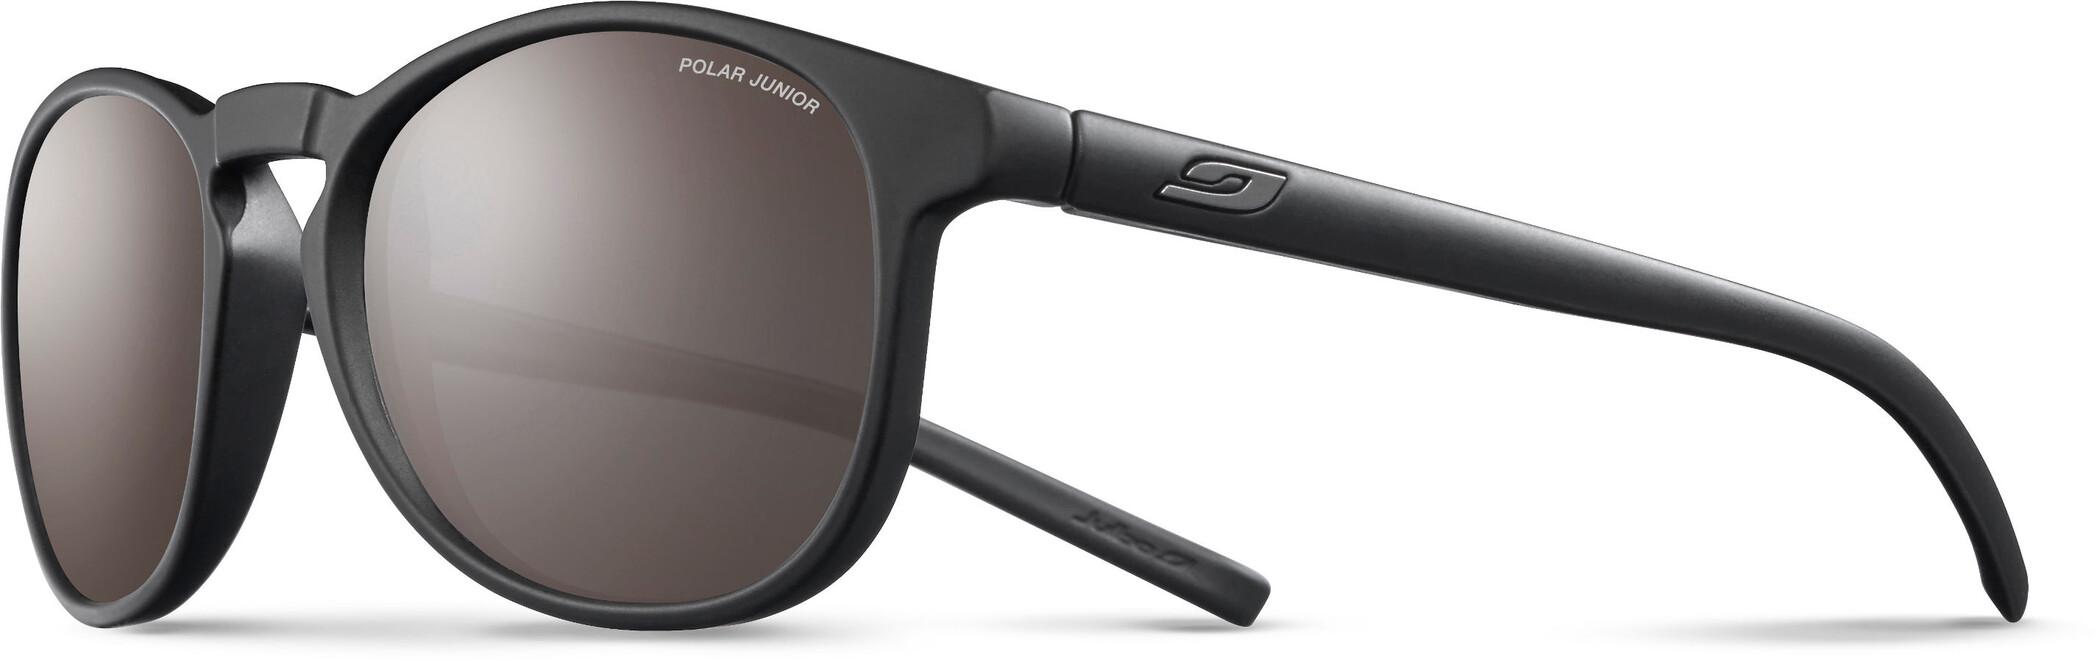 Julbo Fame Polar Sunglasses 10-15Y Kids, matt black-gray (2020) | Glasses